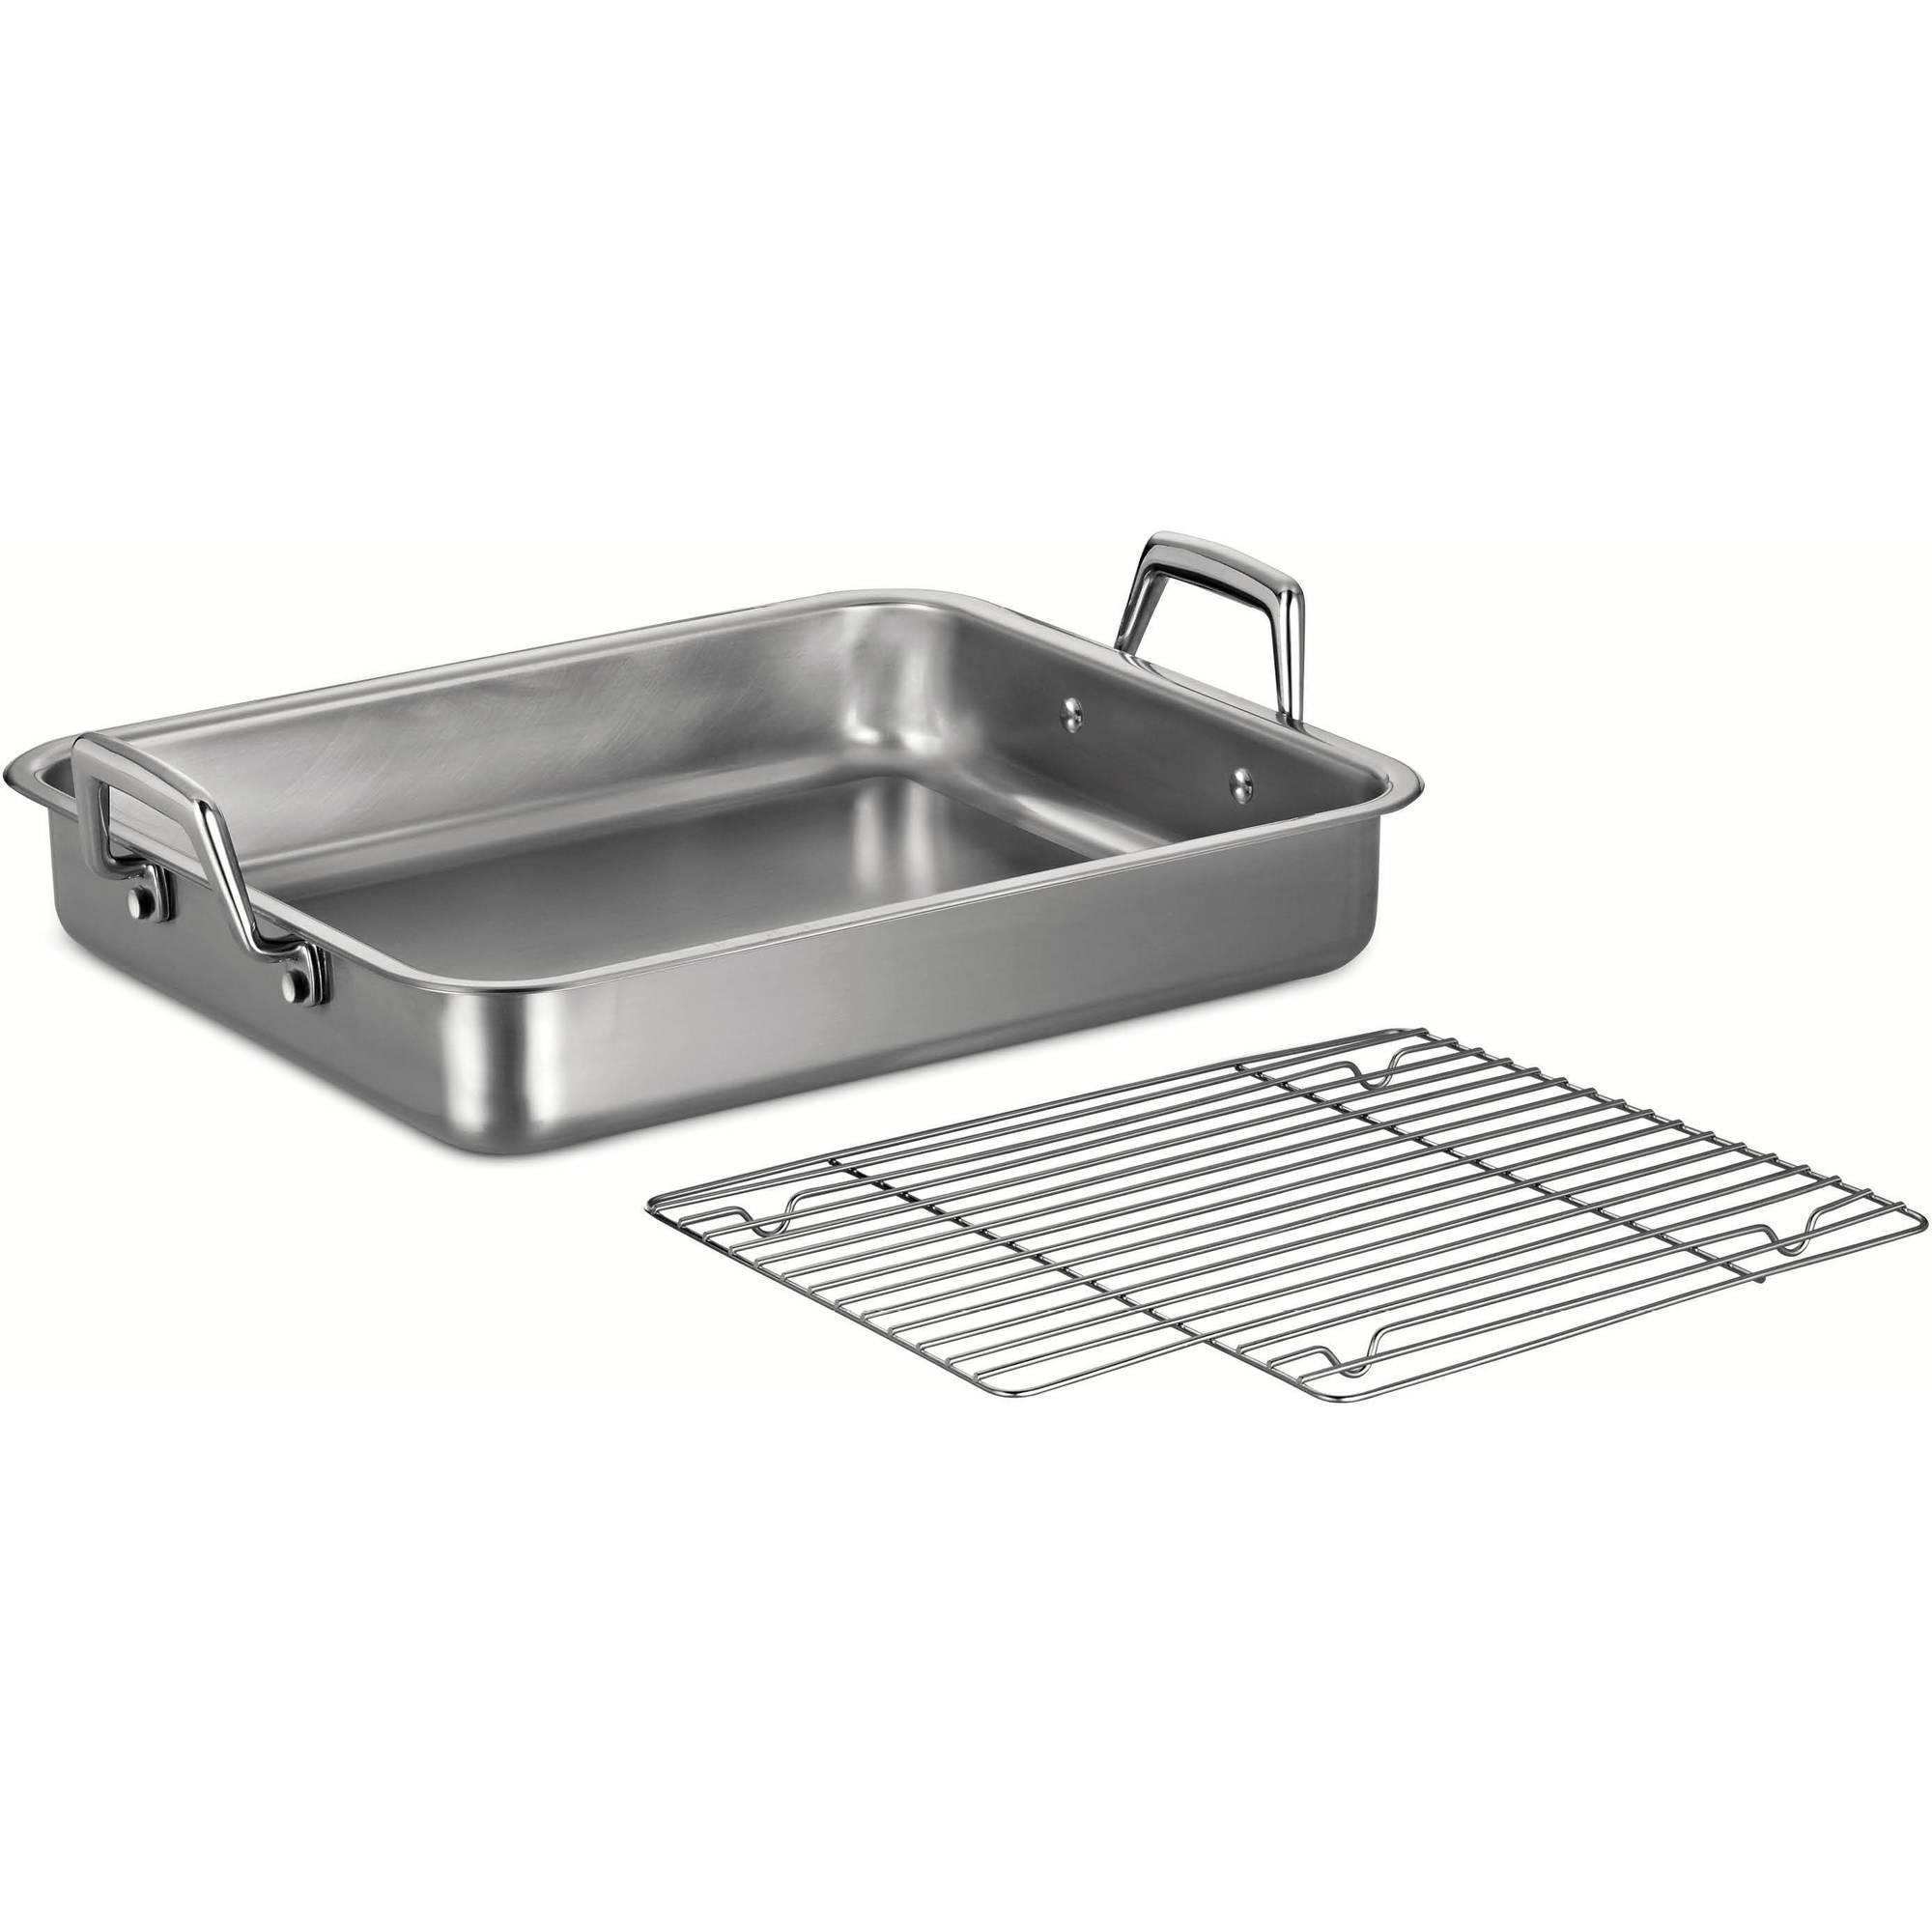 "Tramontina Prima 15"" Roasting Pan with Basting Grill"